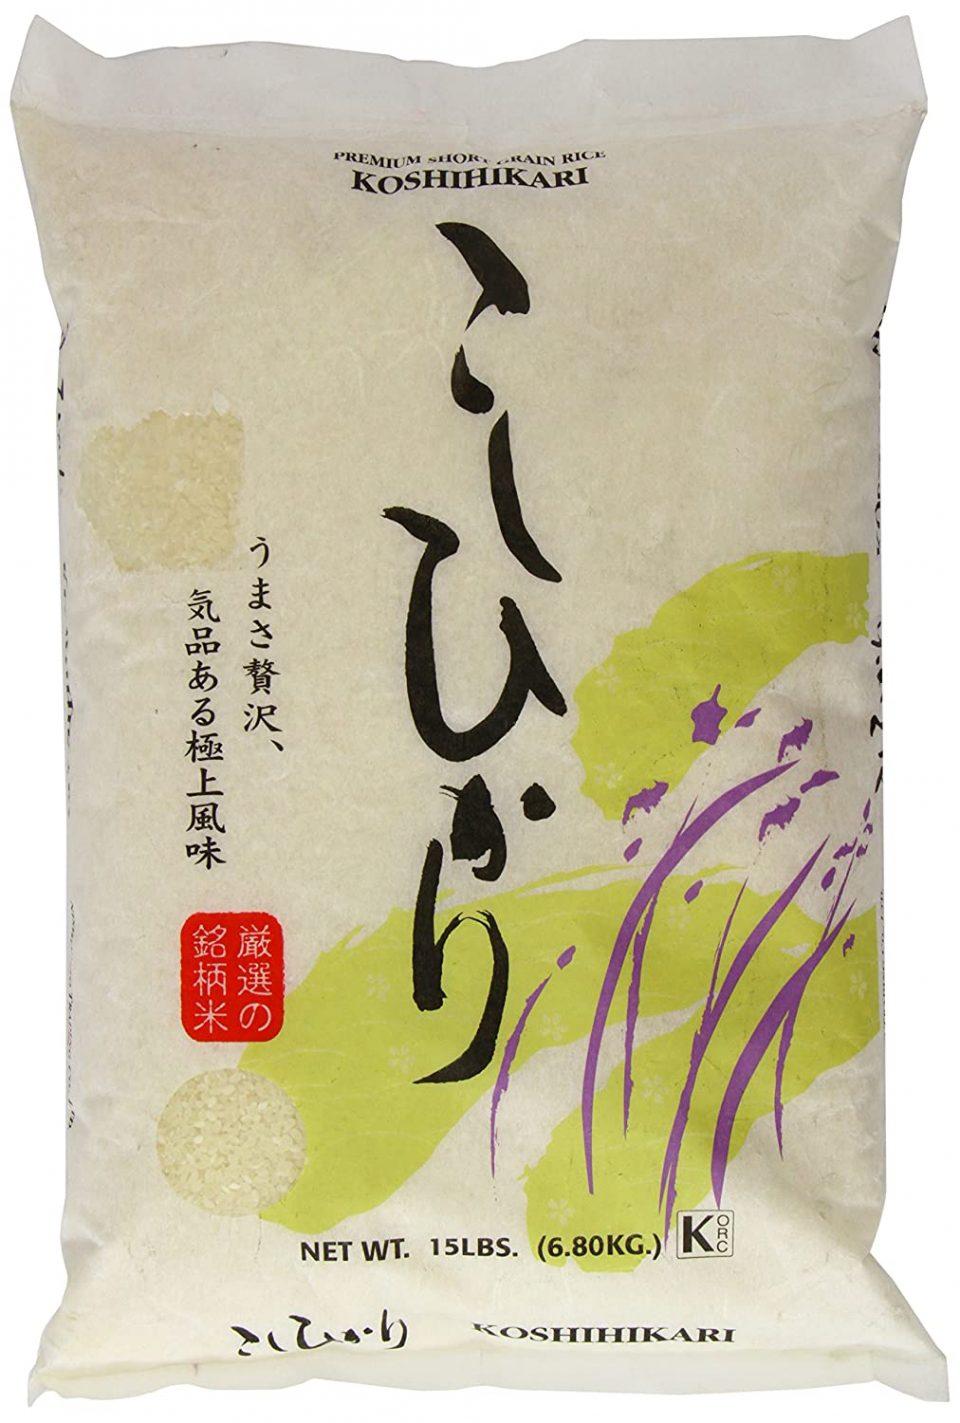 Koshihikari Rice by Shirakiku